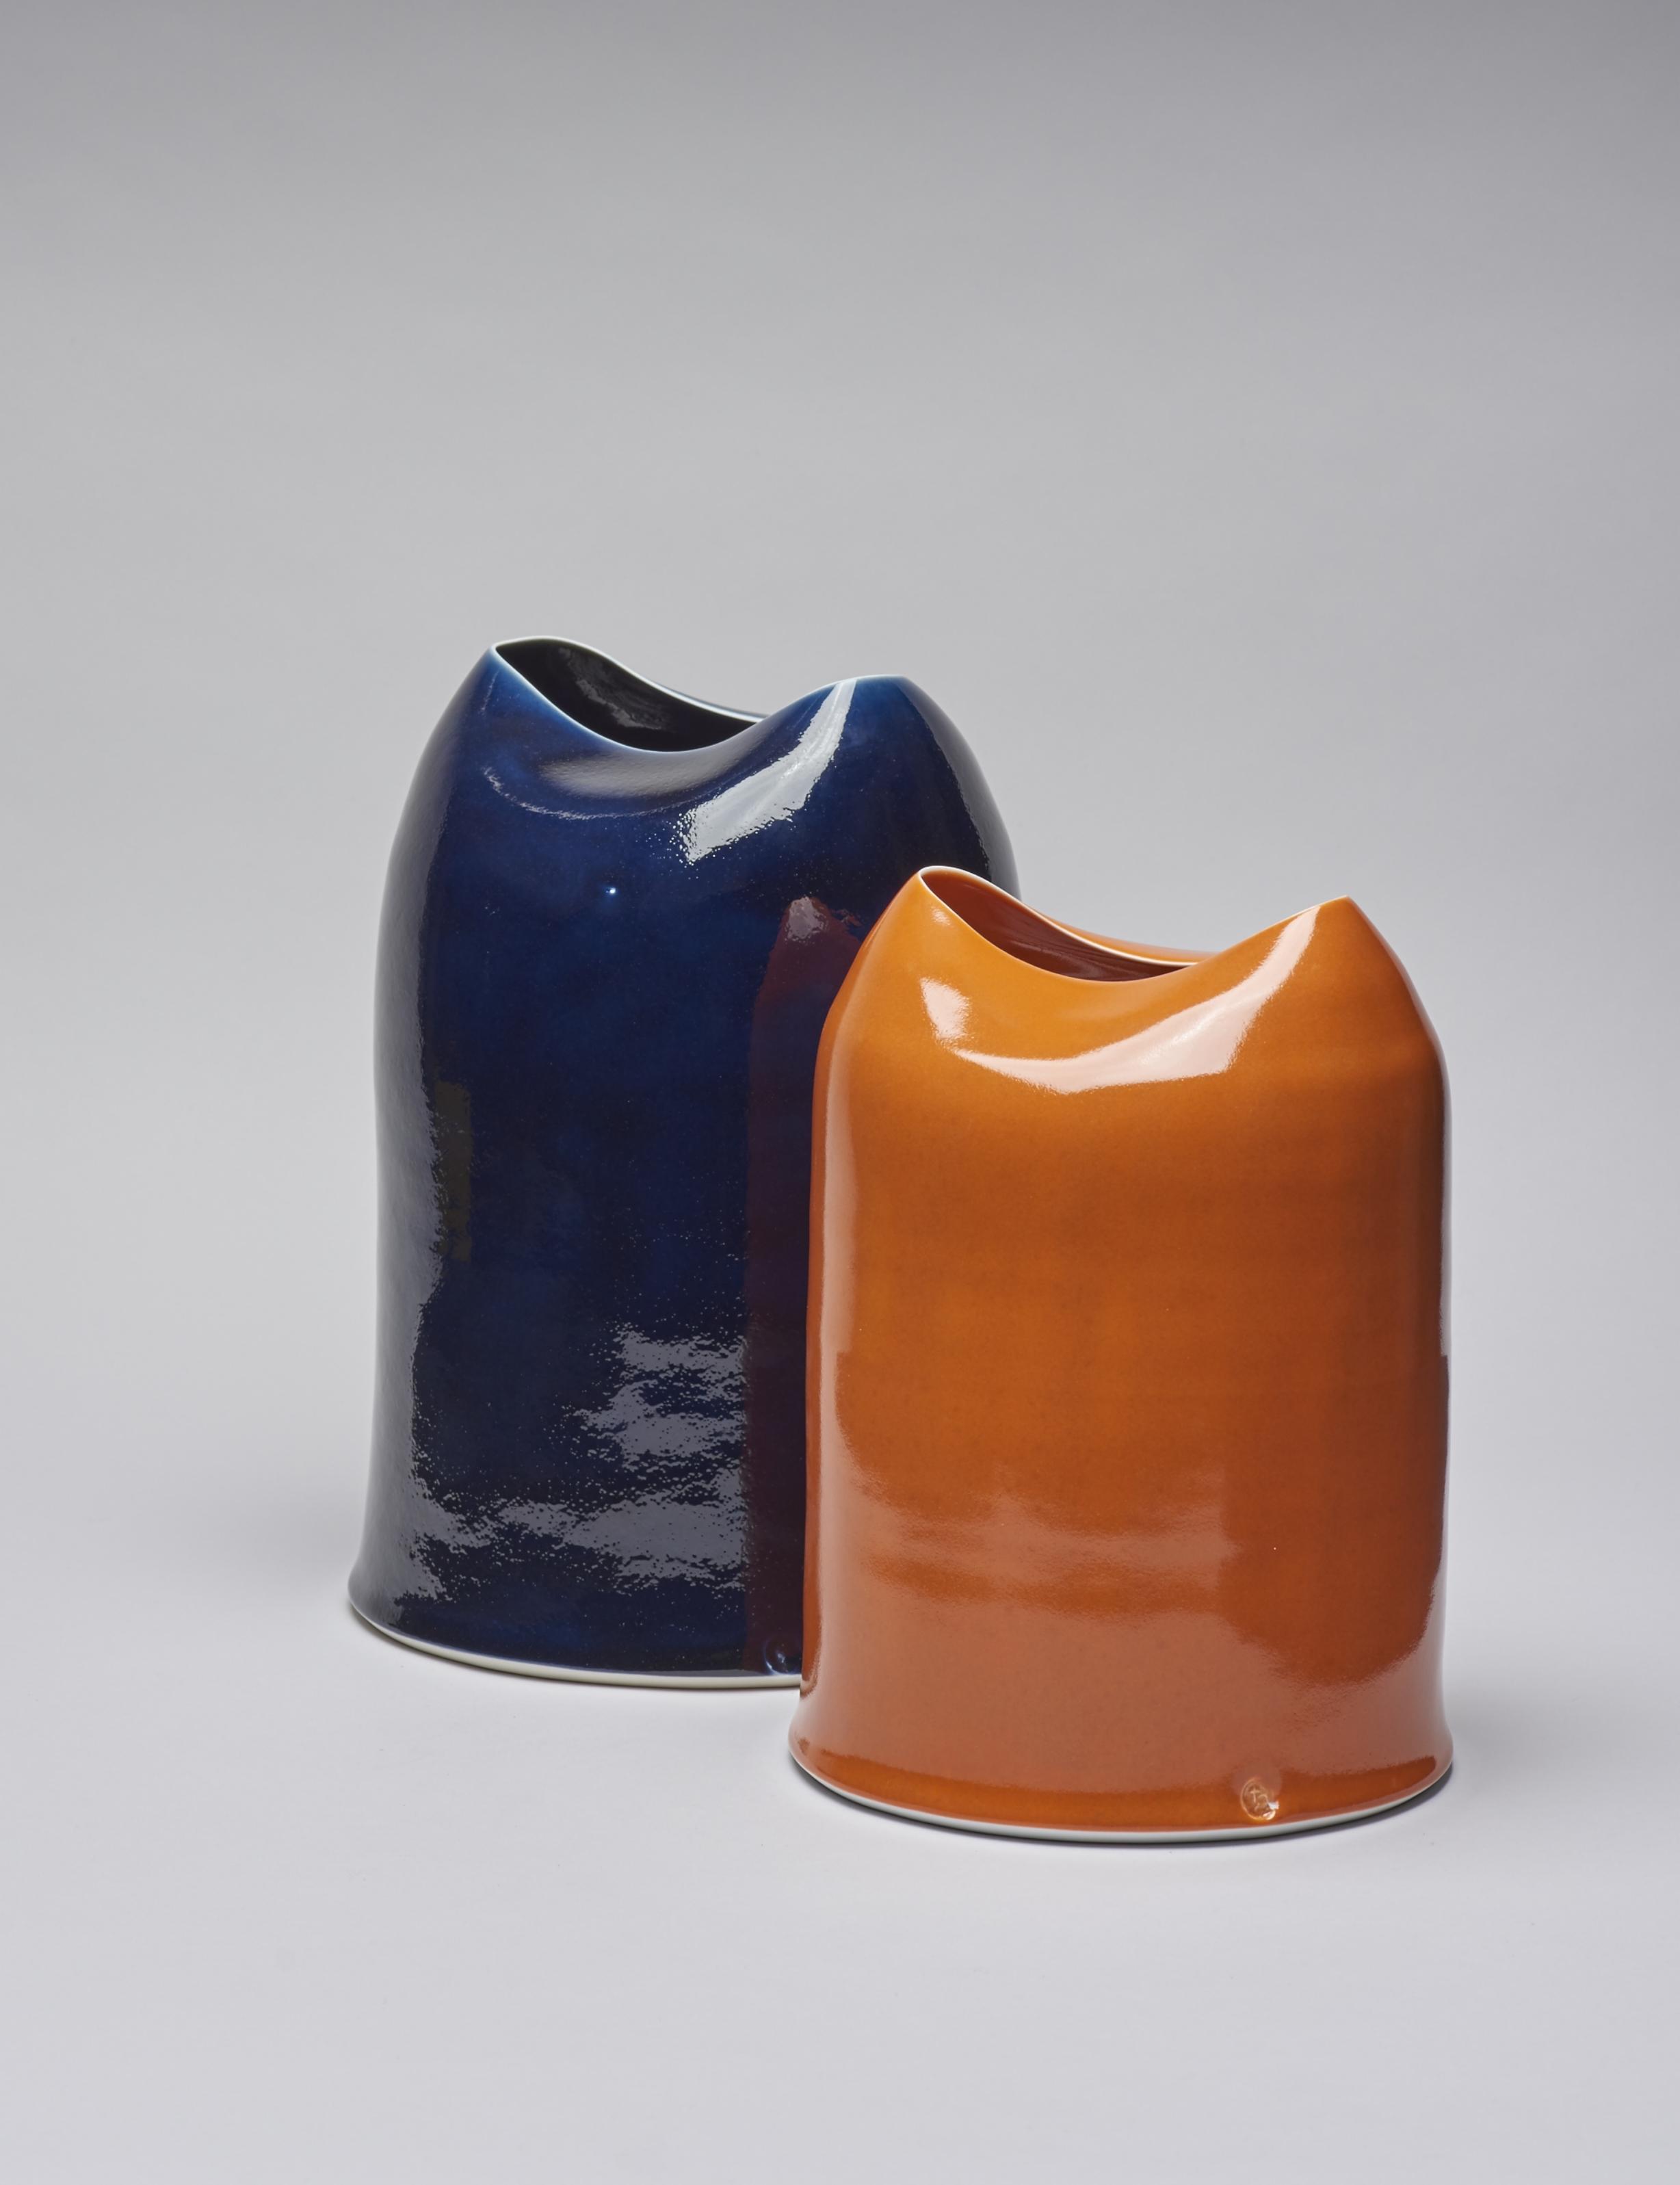 Midnight and Orange Glow Vessels